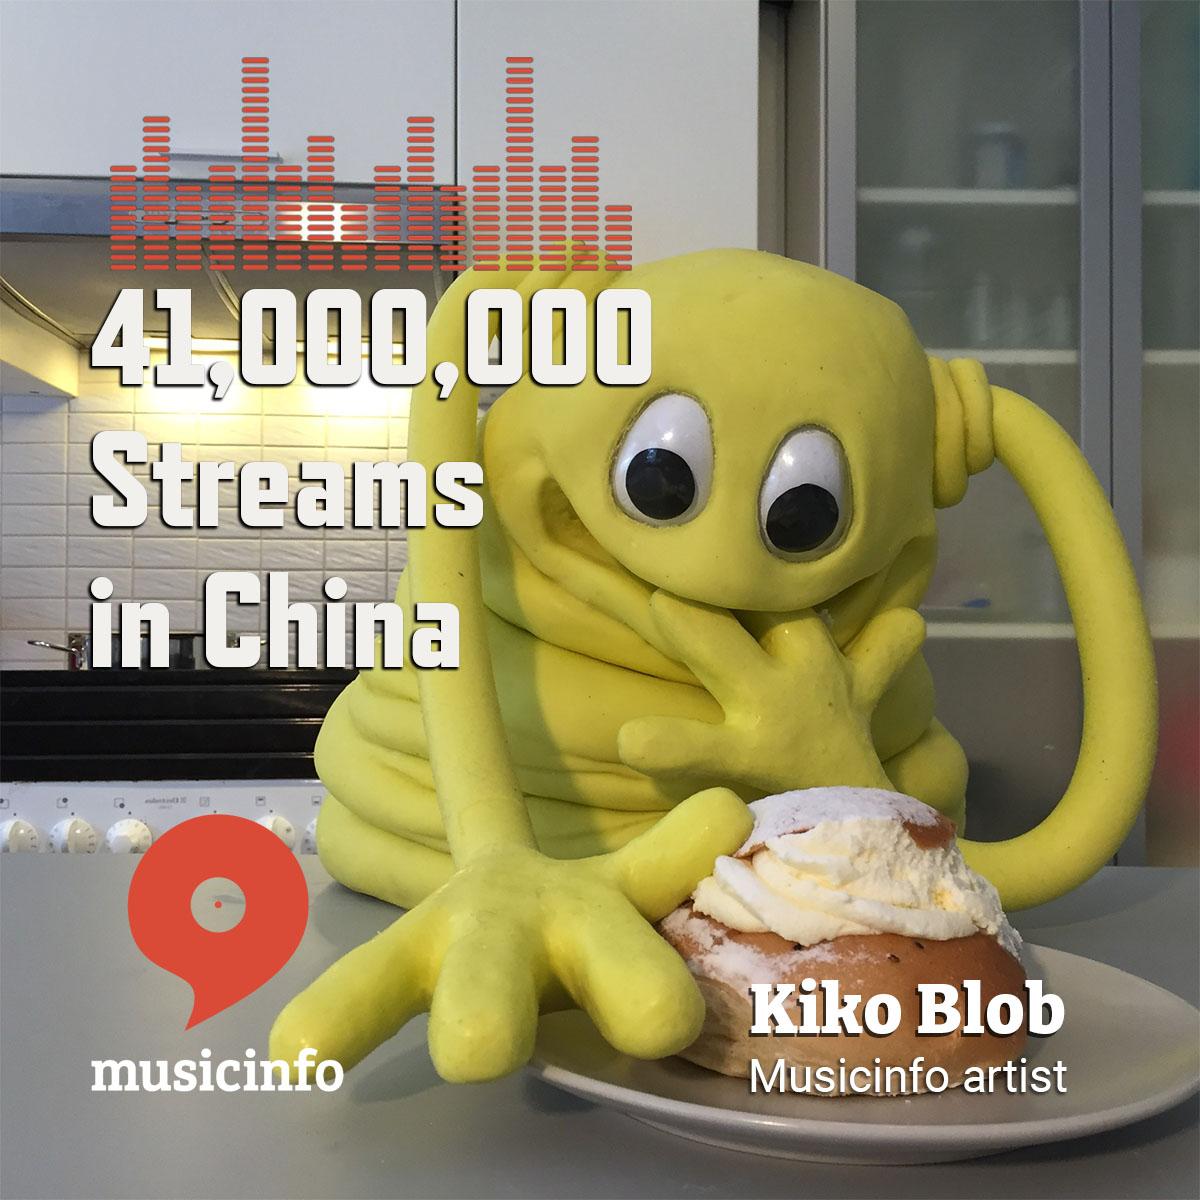 Kiko Blob